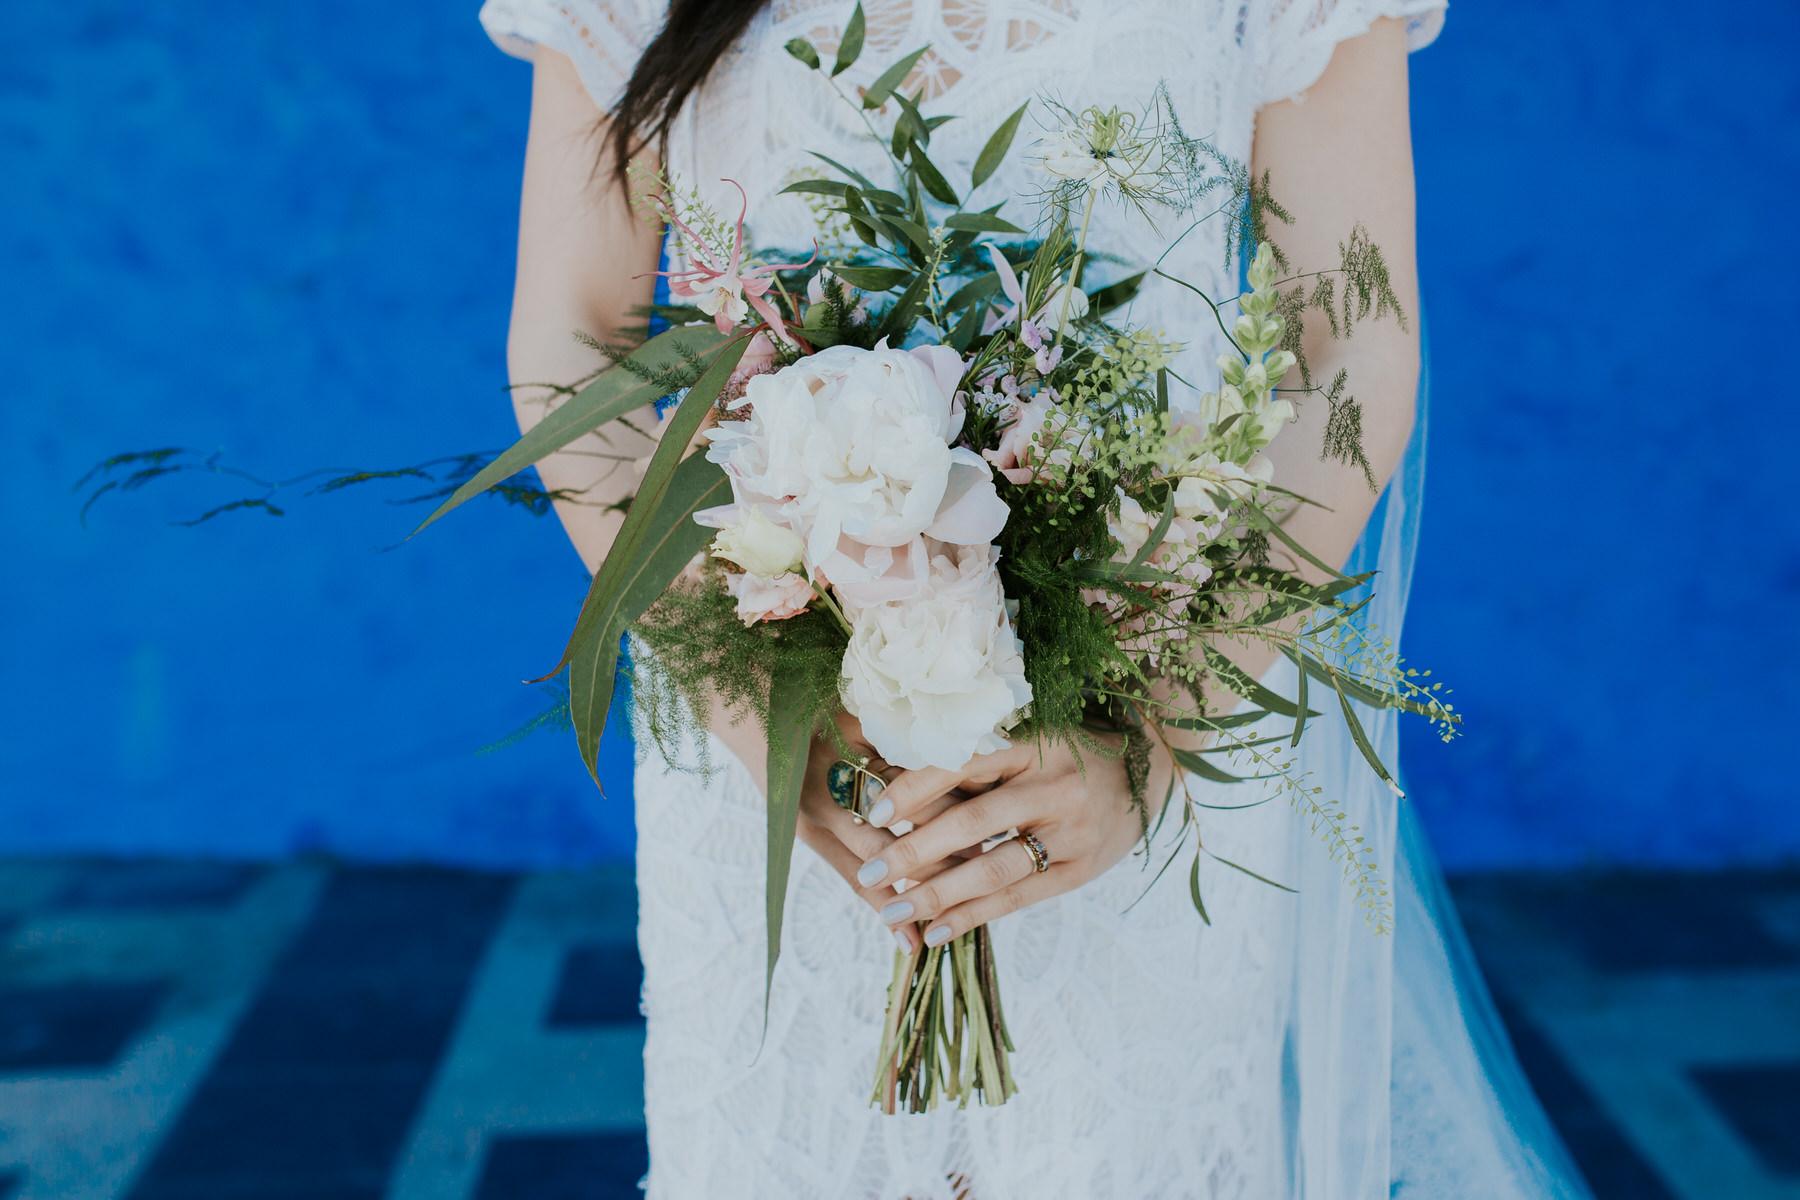 621 Shaina's wildflower wedding bouquet blue wall Portmeirion.jpg